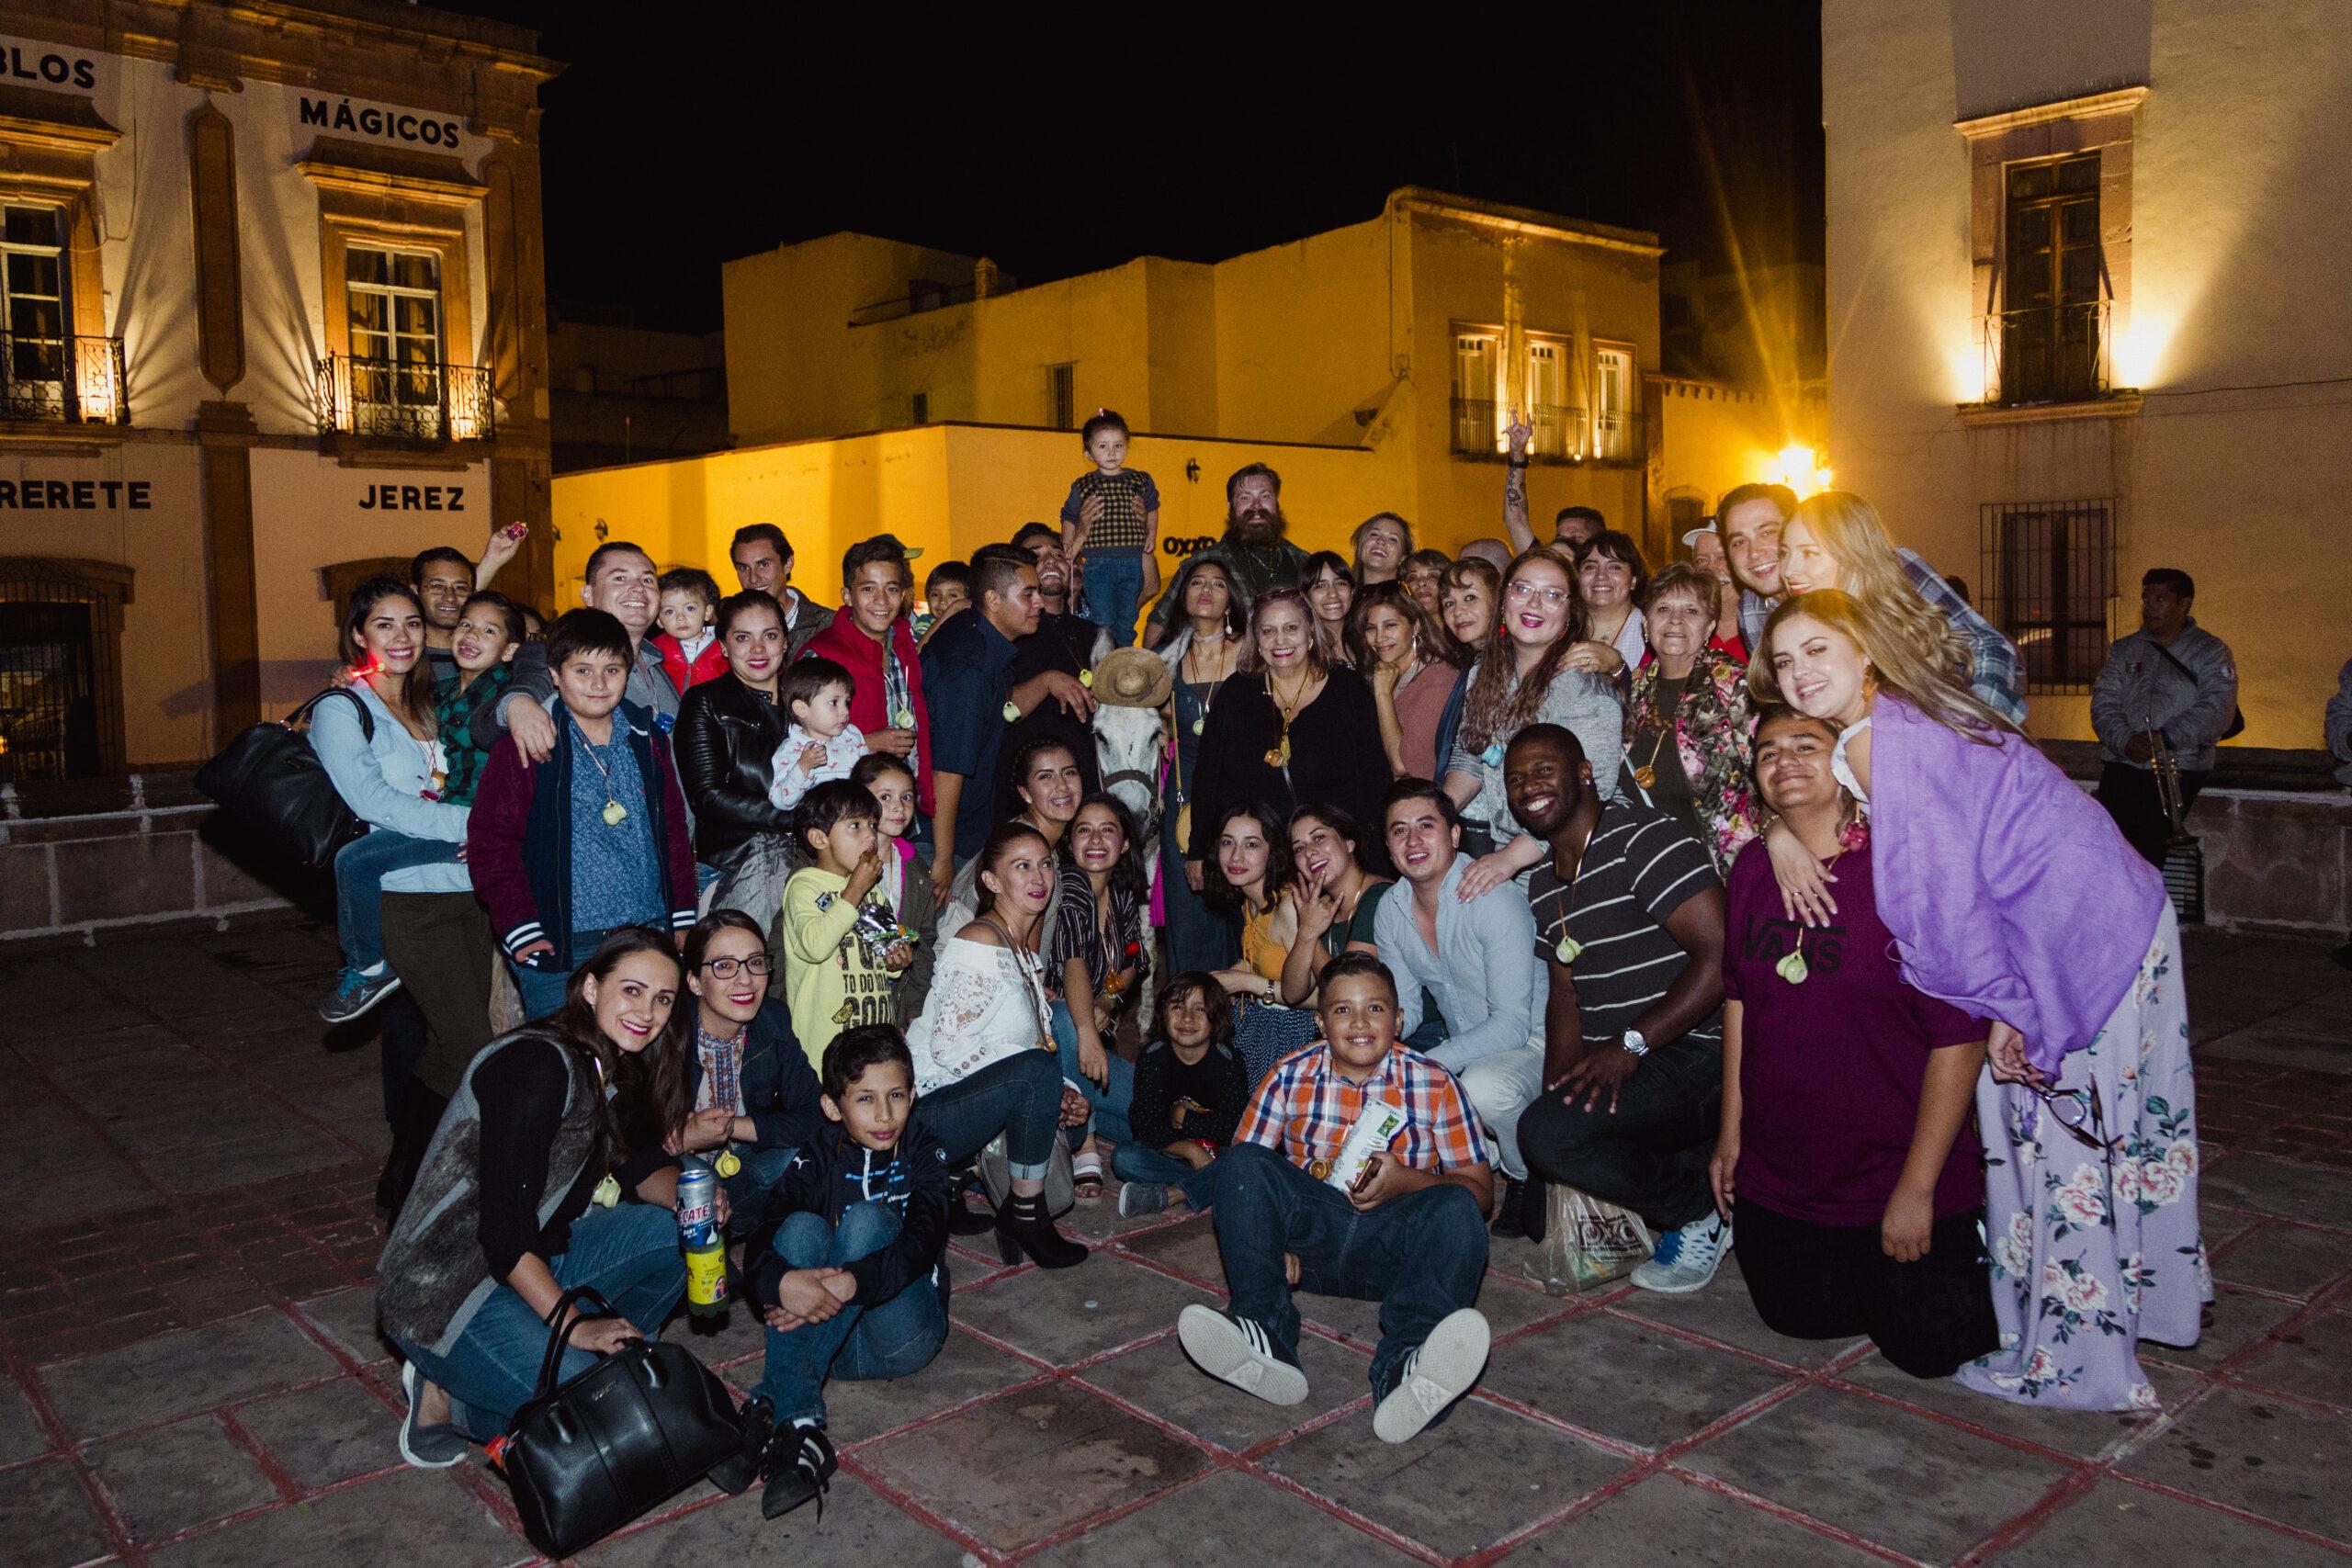 javier_noriega_fotografo_profesional_bodas_zacatecas_mexico_chihuahua_photographer15